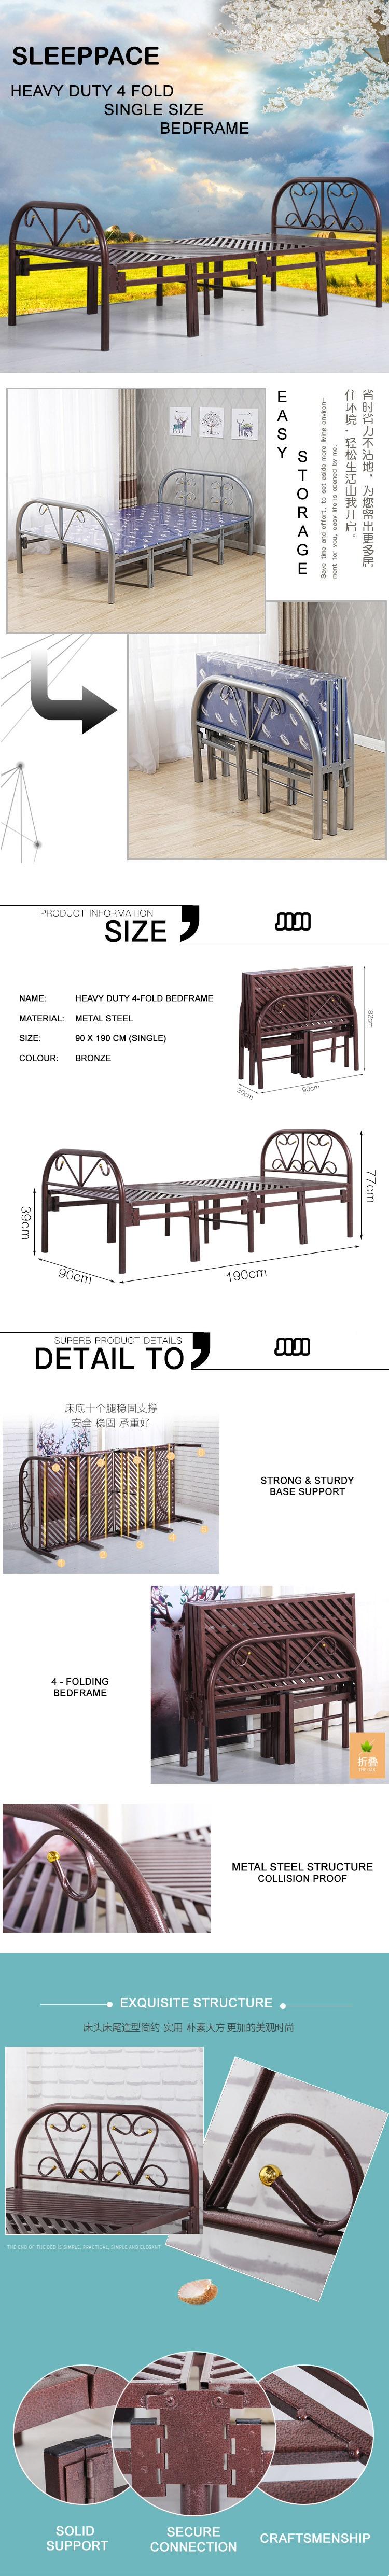 Heavy Duty 4-Fold Bed Frame